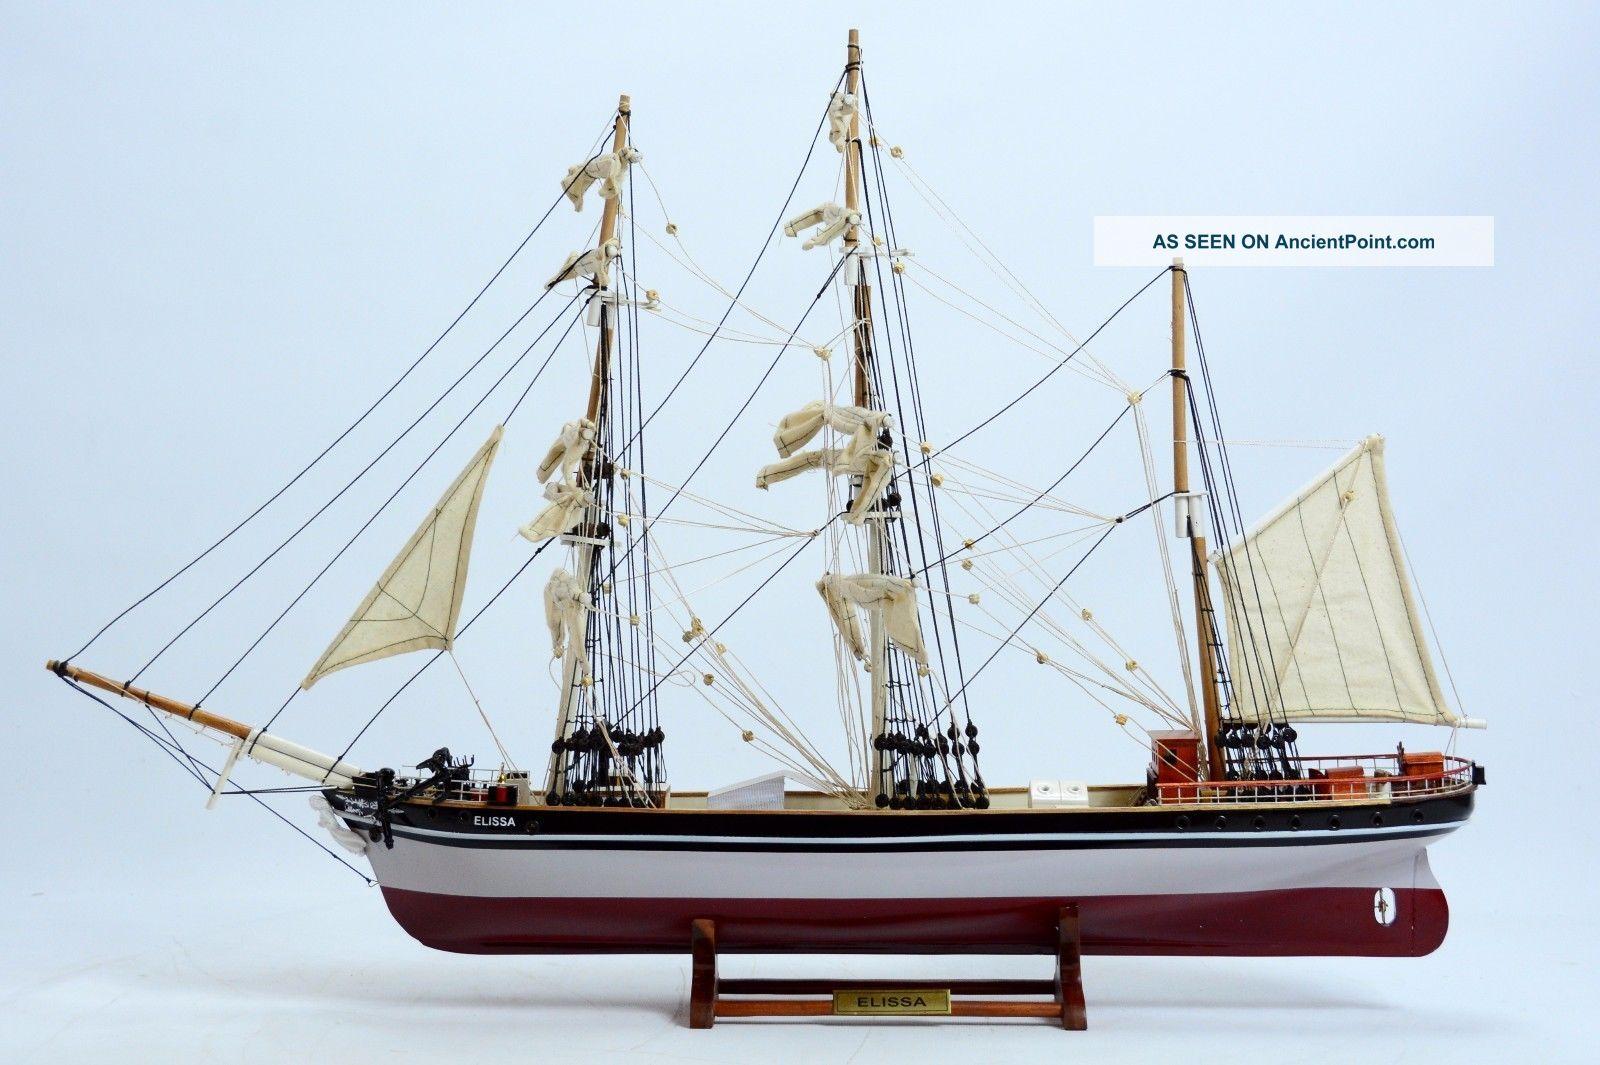 Elissa Galveston Tall Ship 30